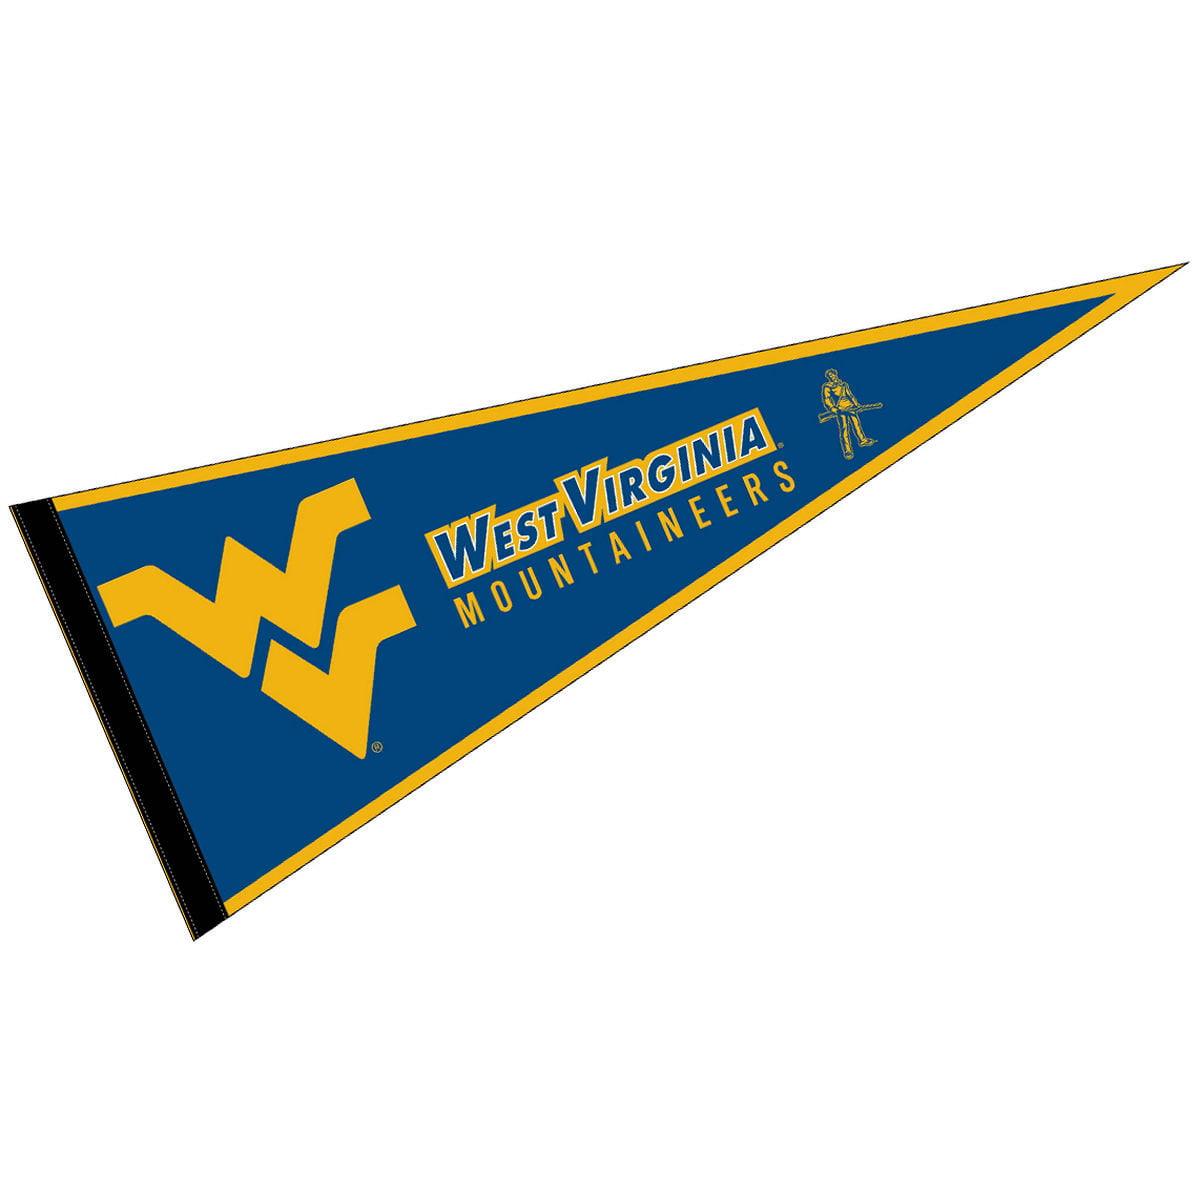 "West Virginia Mountaineers Blue 12"" X 30"" Felt College Pennant"